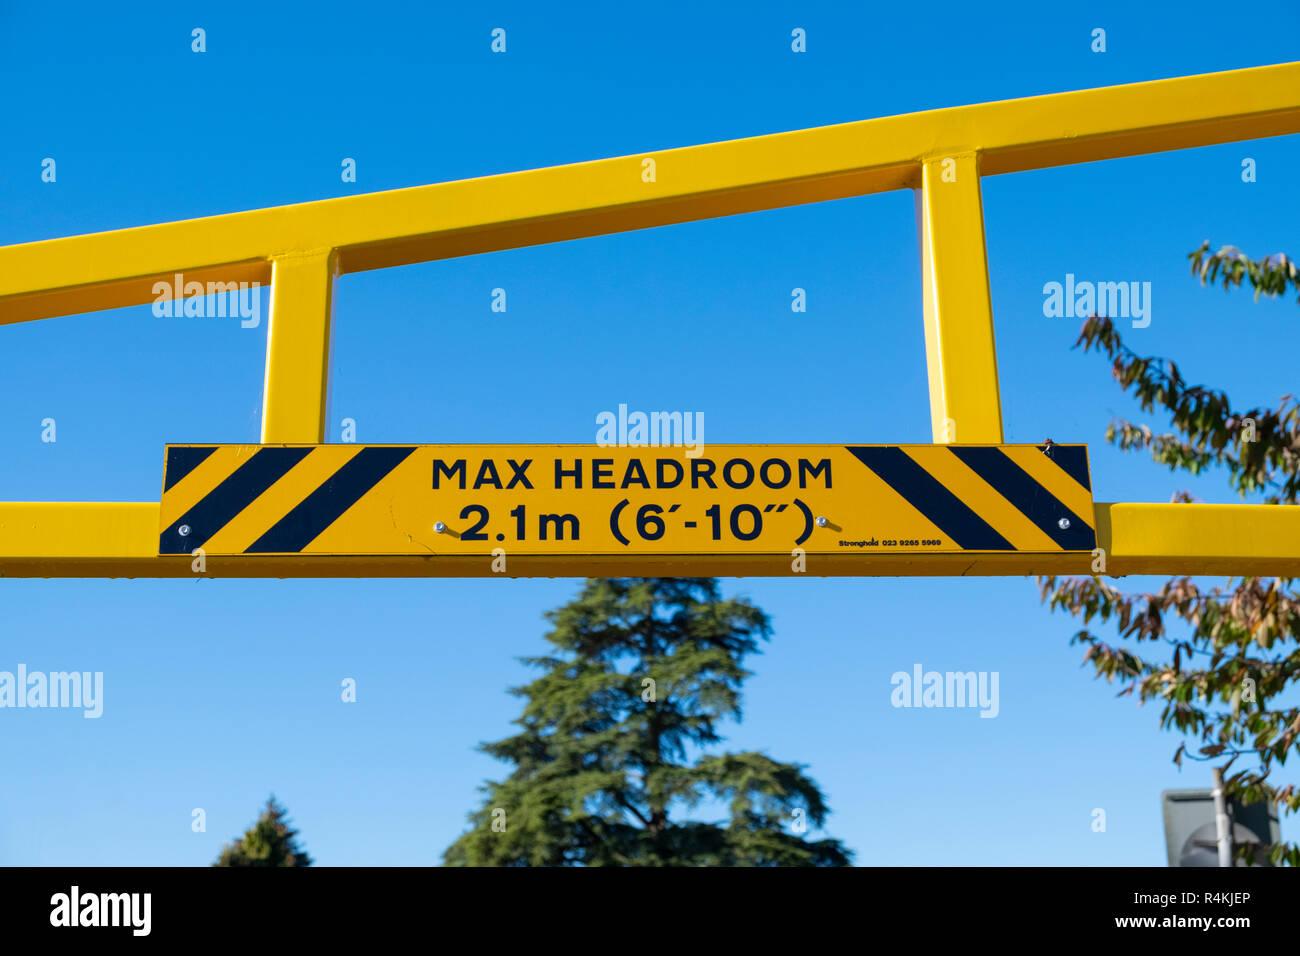 Maximum headroom sign in a car park - Stock Image